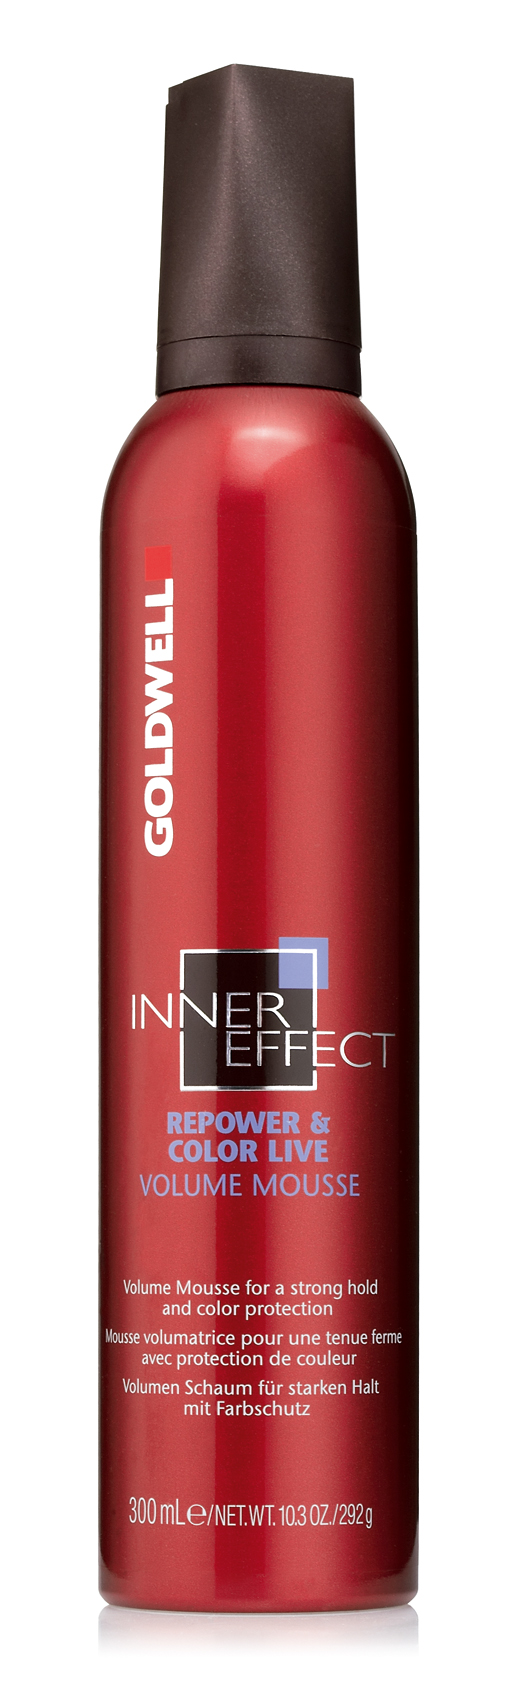 Goldwell Innereffect Repower & Color Live Volume Mousse - HaarfijnShop ...